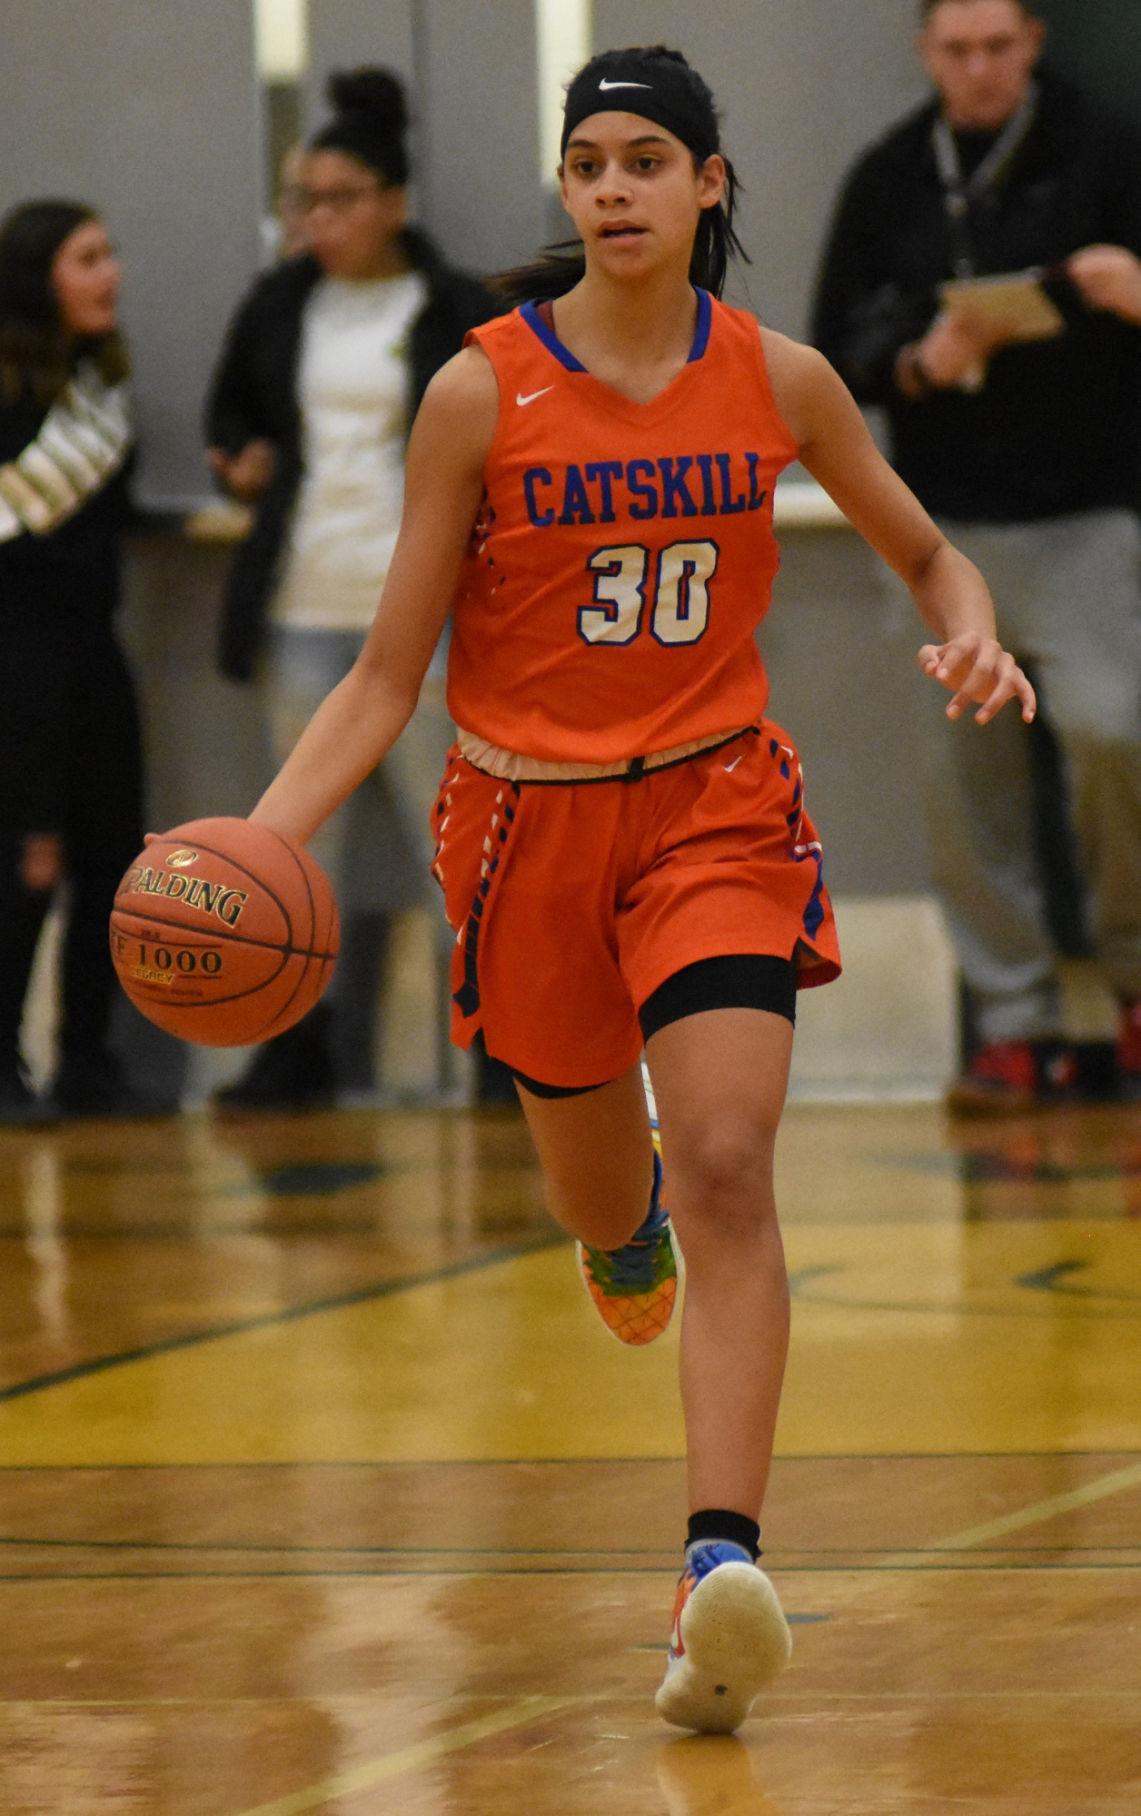 GIRLS BASKETBALL: Hudson pulls away from Catskill